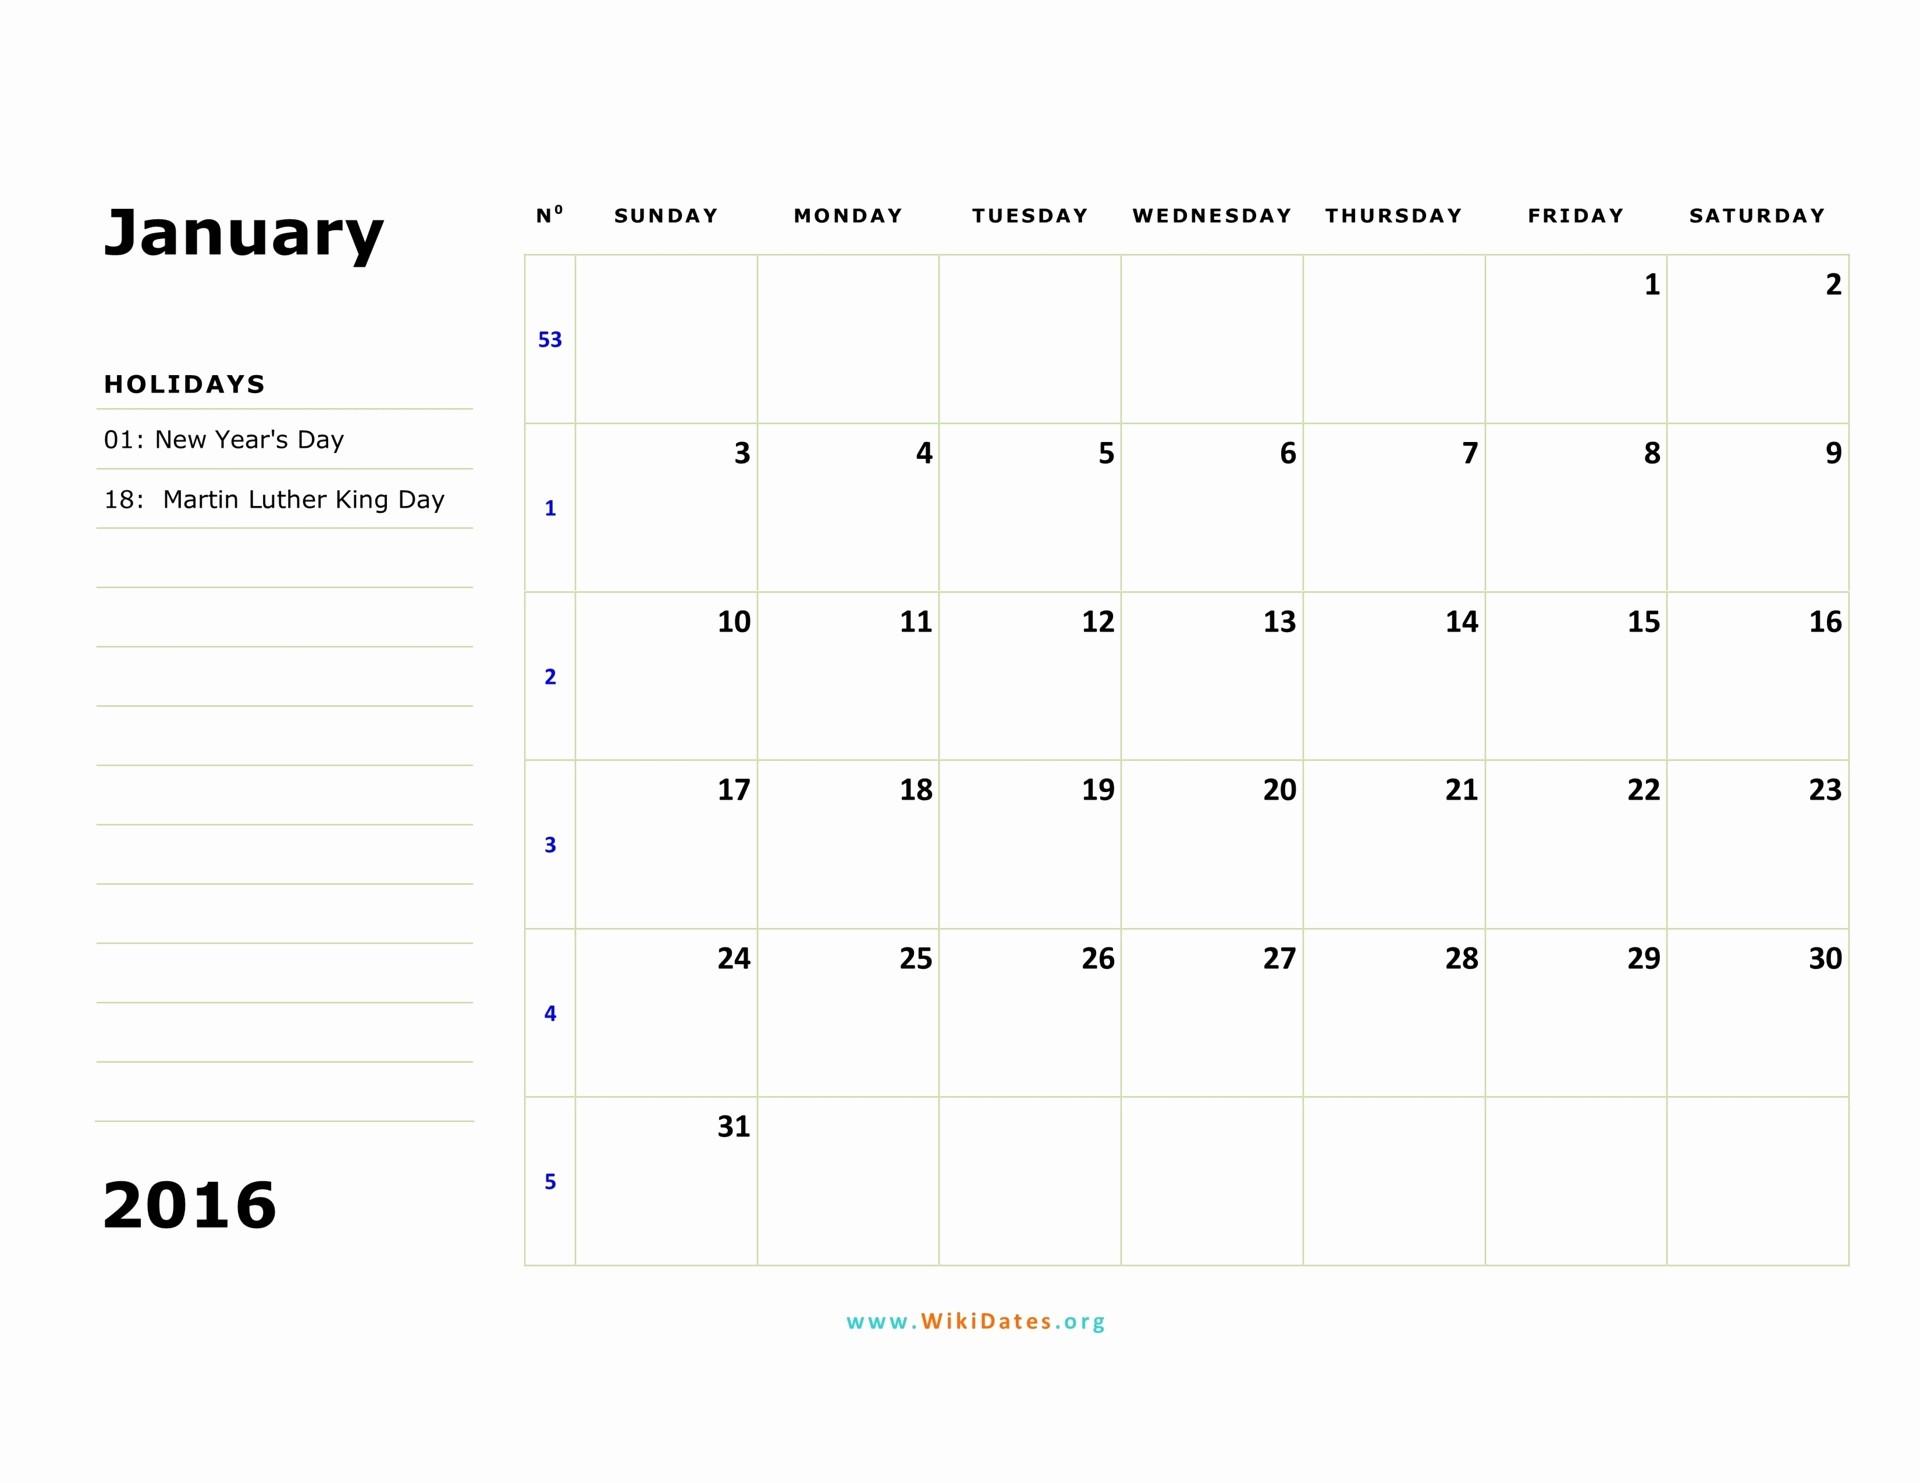 January 2016 Calendar Template Word New January 2016 Calendar